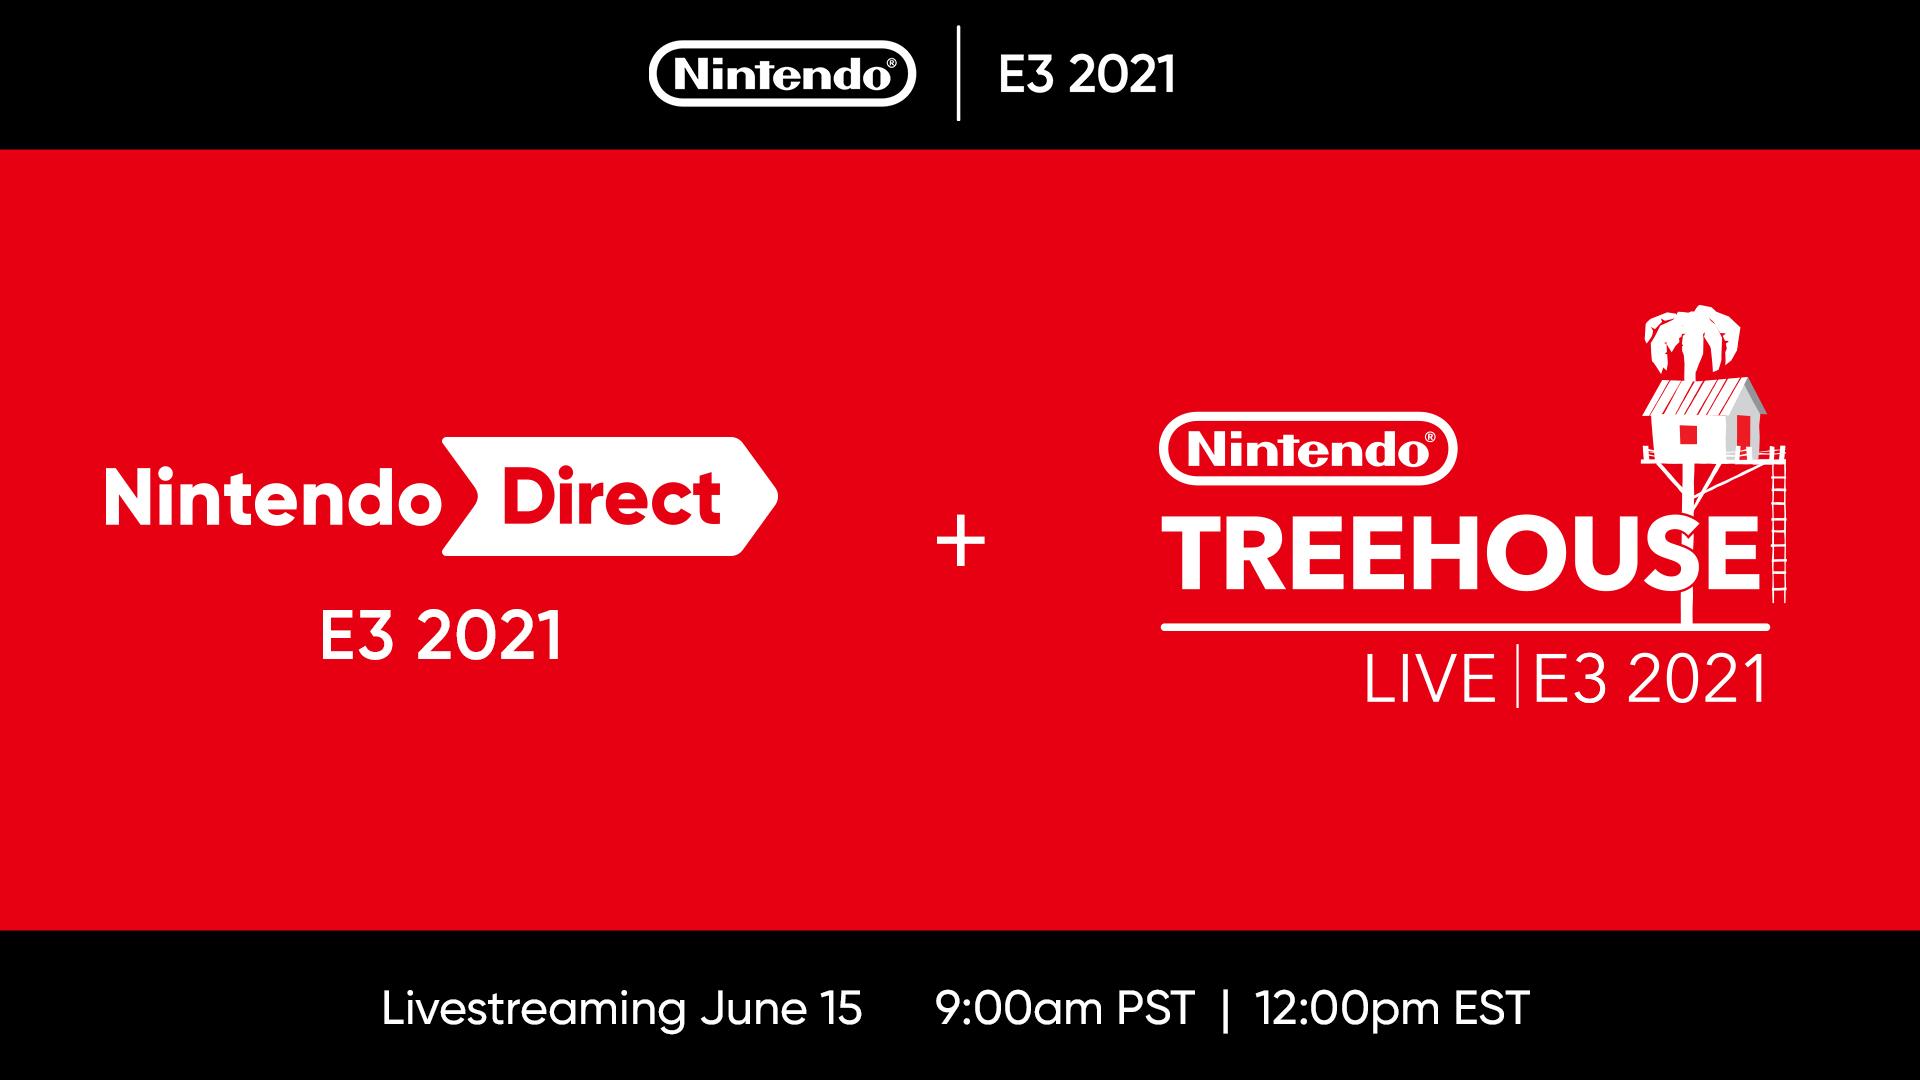 Nintendo Direct: E3 2021 and Nintendo Treehouse Live at E3 2021